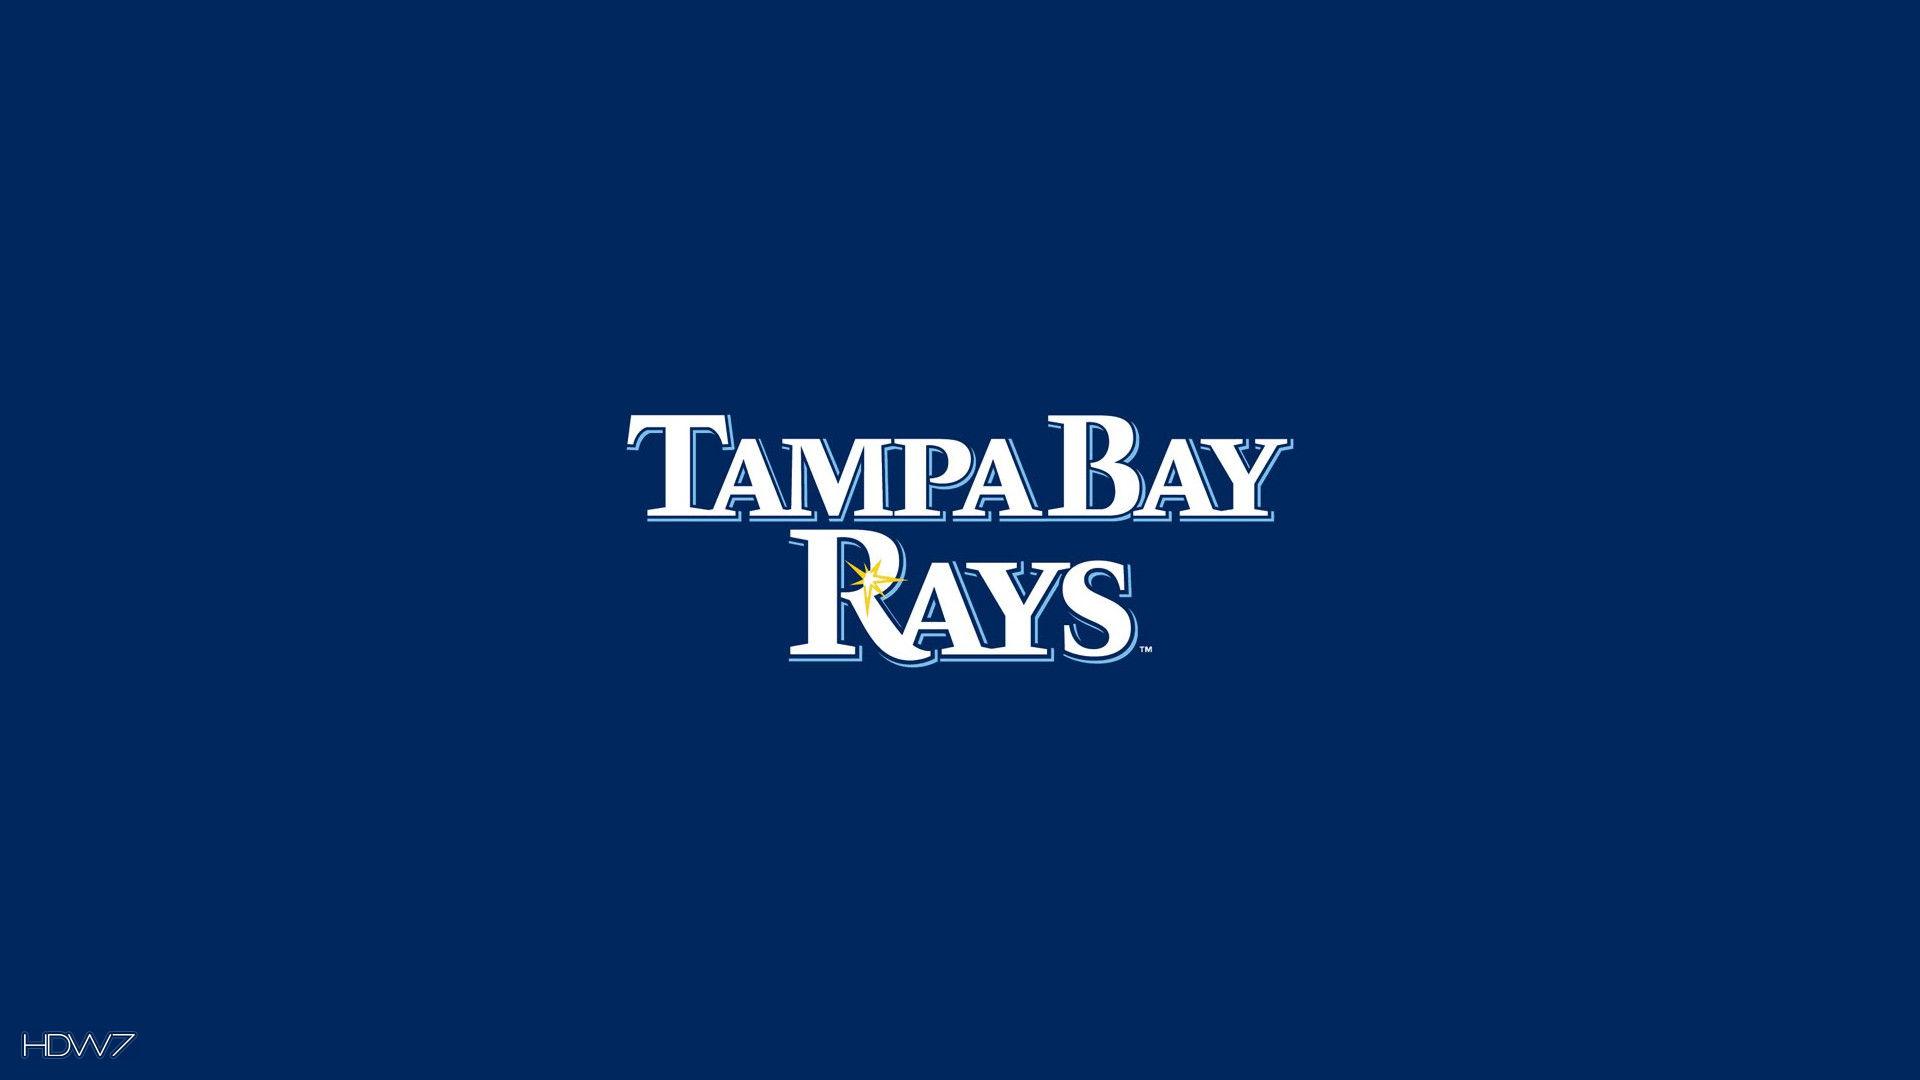 wallpaper name tampa bay rays 1080p jpg wallpaper added may 24 2015 1920x1080